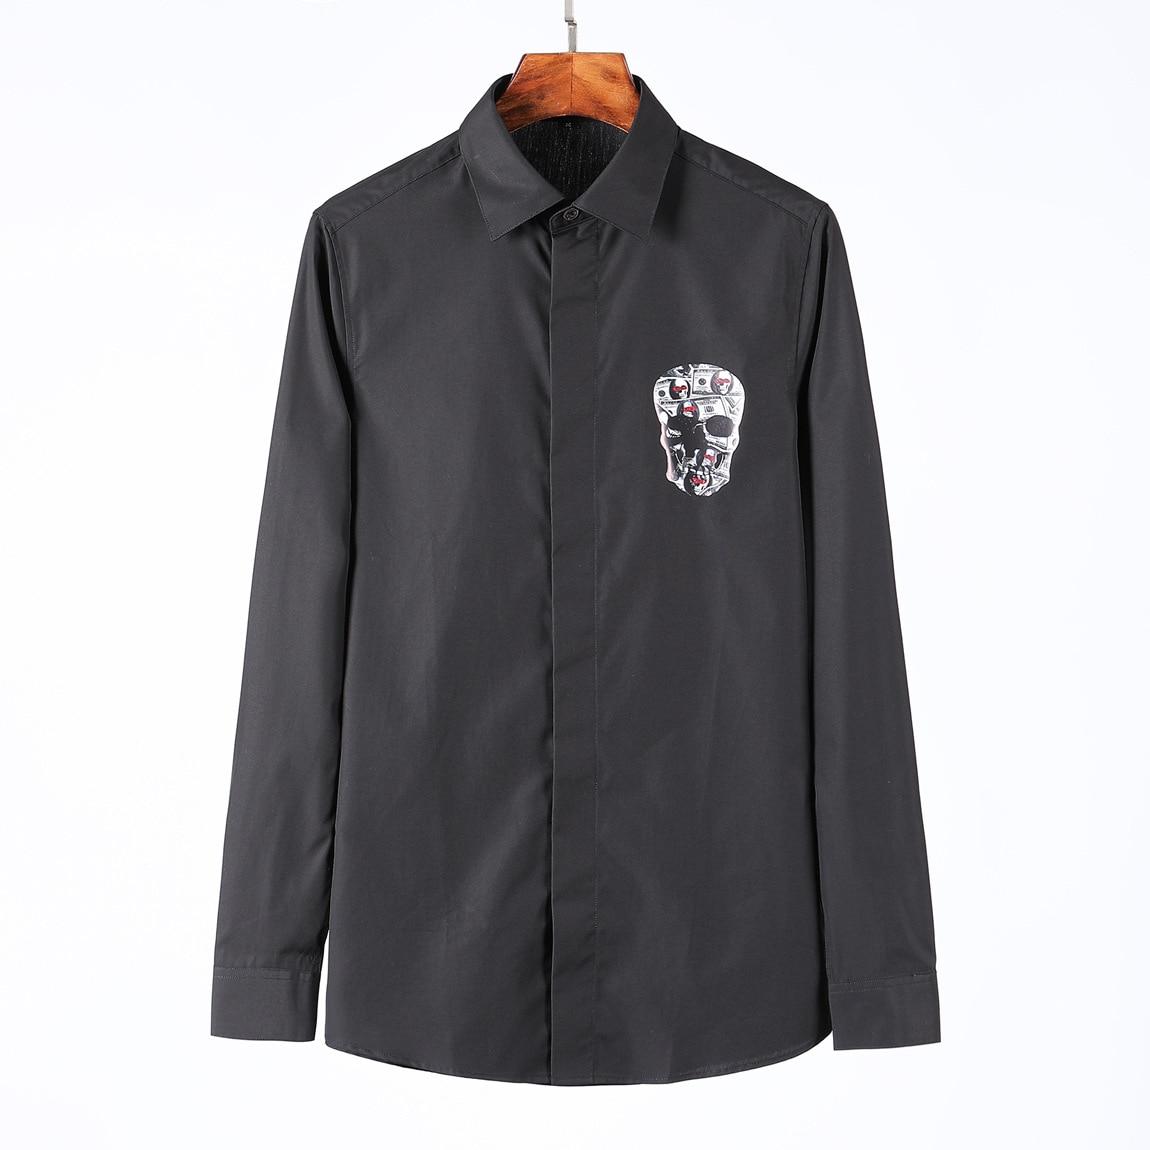 2019 Camisa de vestir para hombres de manga larga de alta calidad camisas de calavera de algodón peinado de diseñador para hombre Casual ropa abrigos Camisa Masculina 4XL